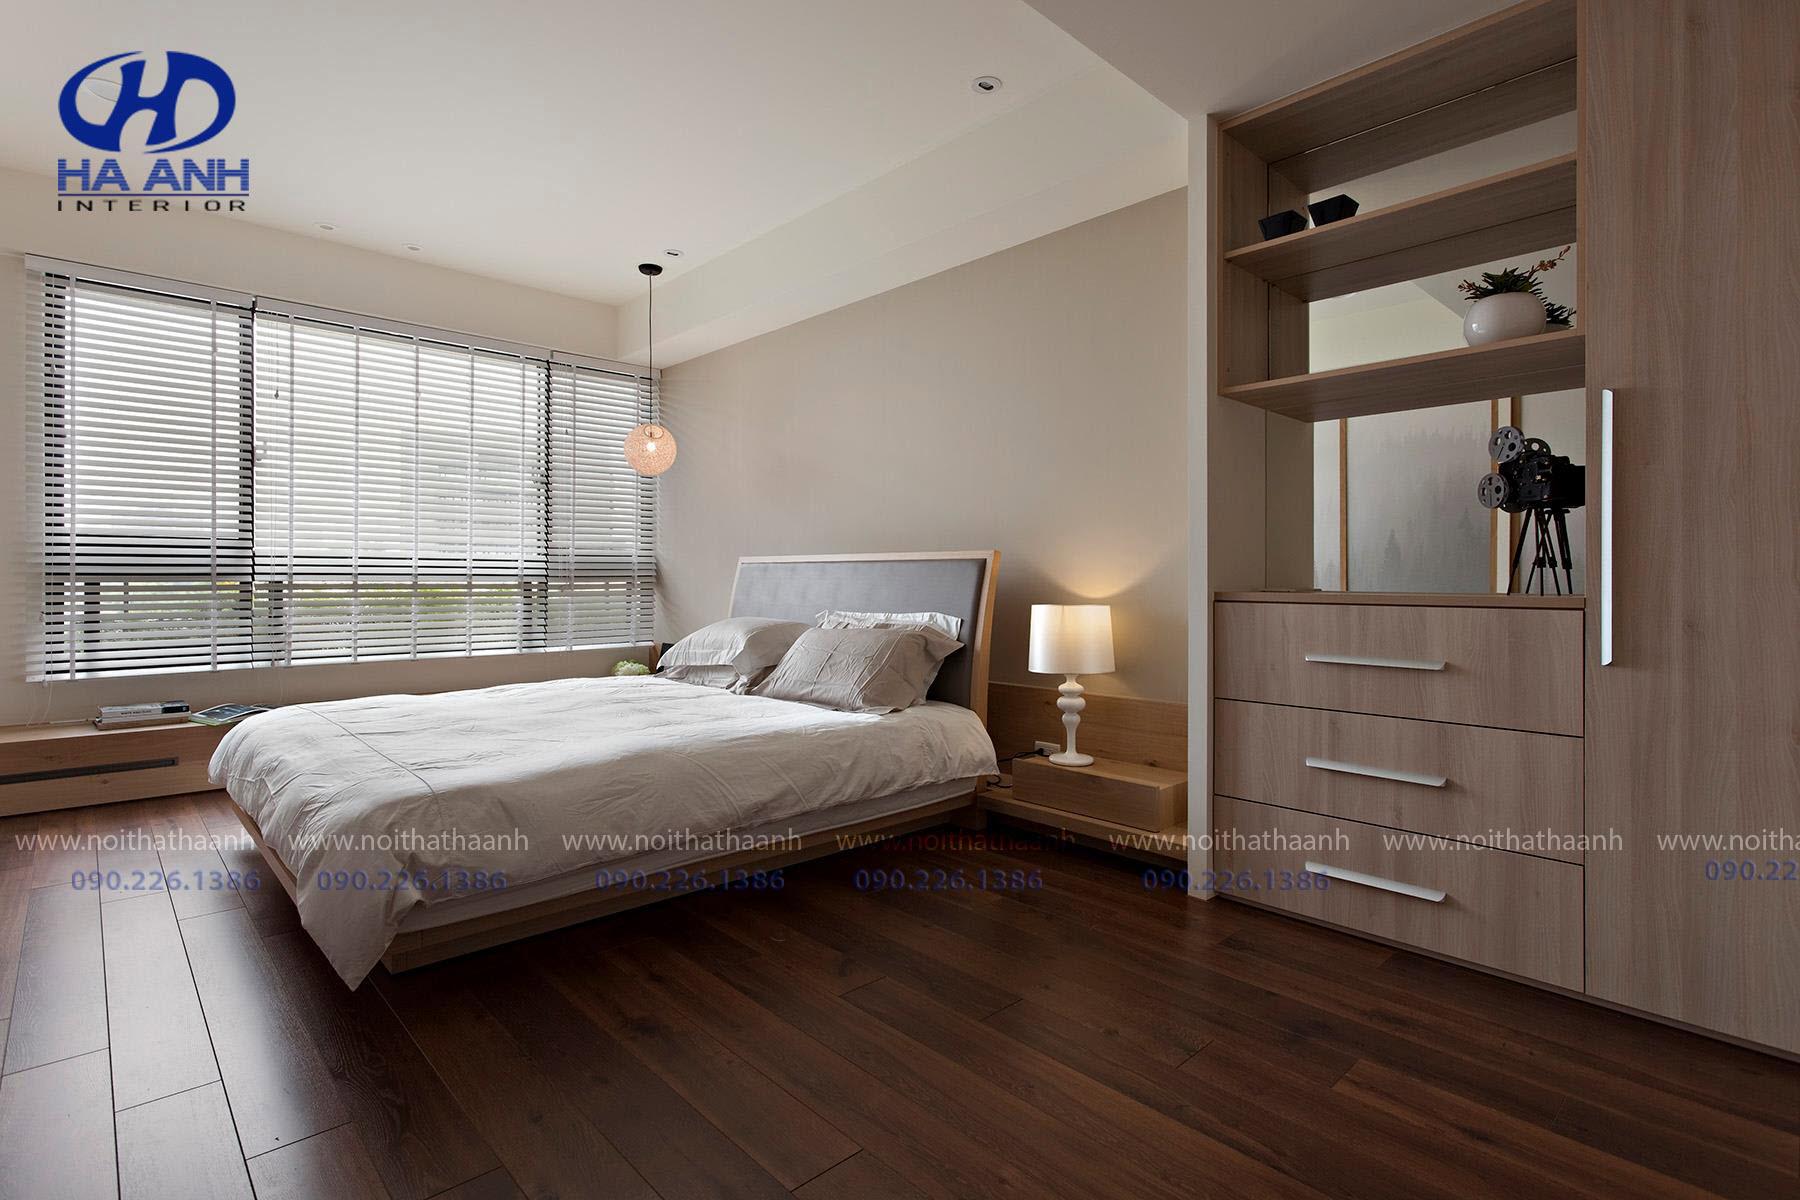 Giường ngủ laminate HA-8311